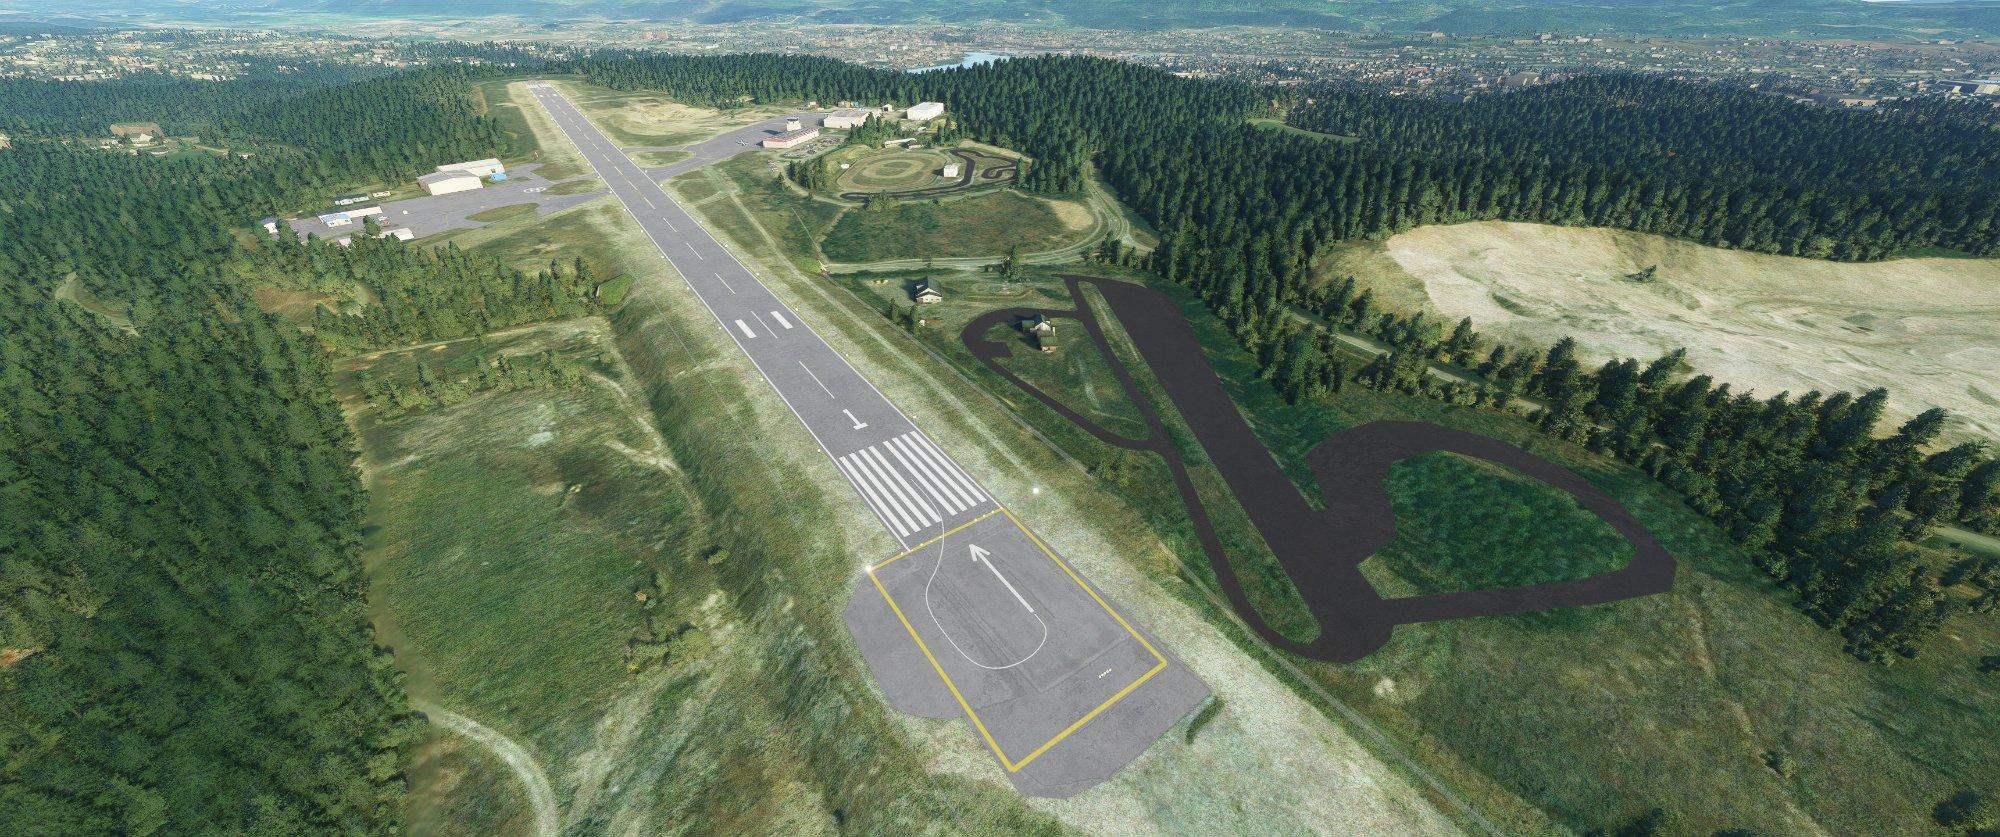 Microsoft Flight Simulator Screenshot 2020.11.01 - 12.14.31.86.jpg